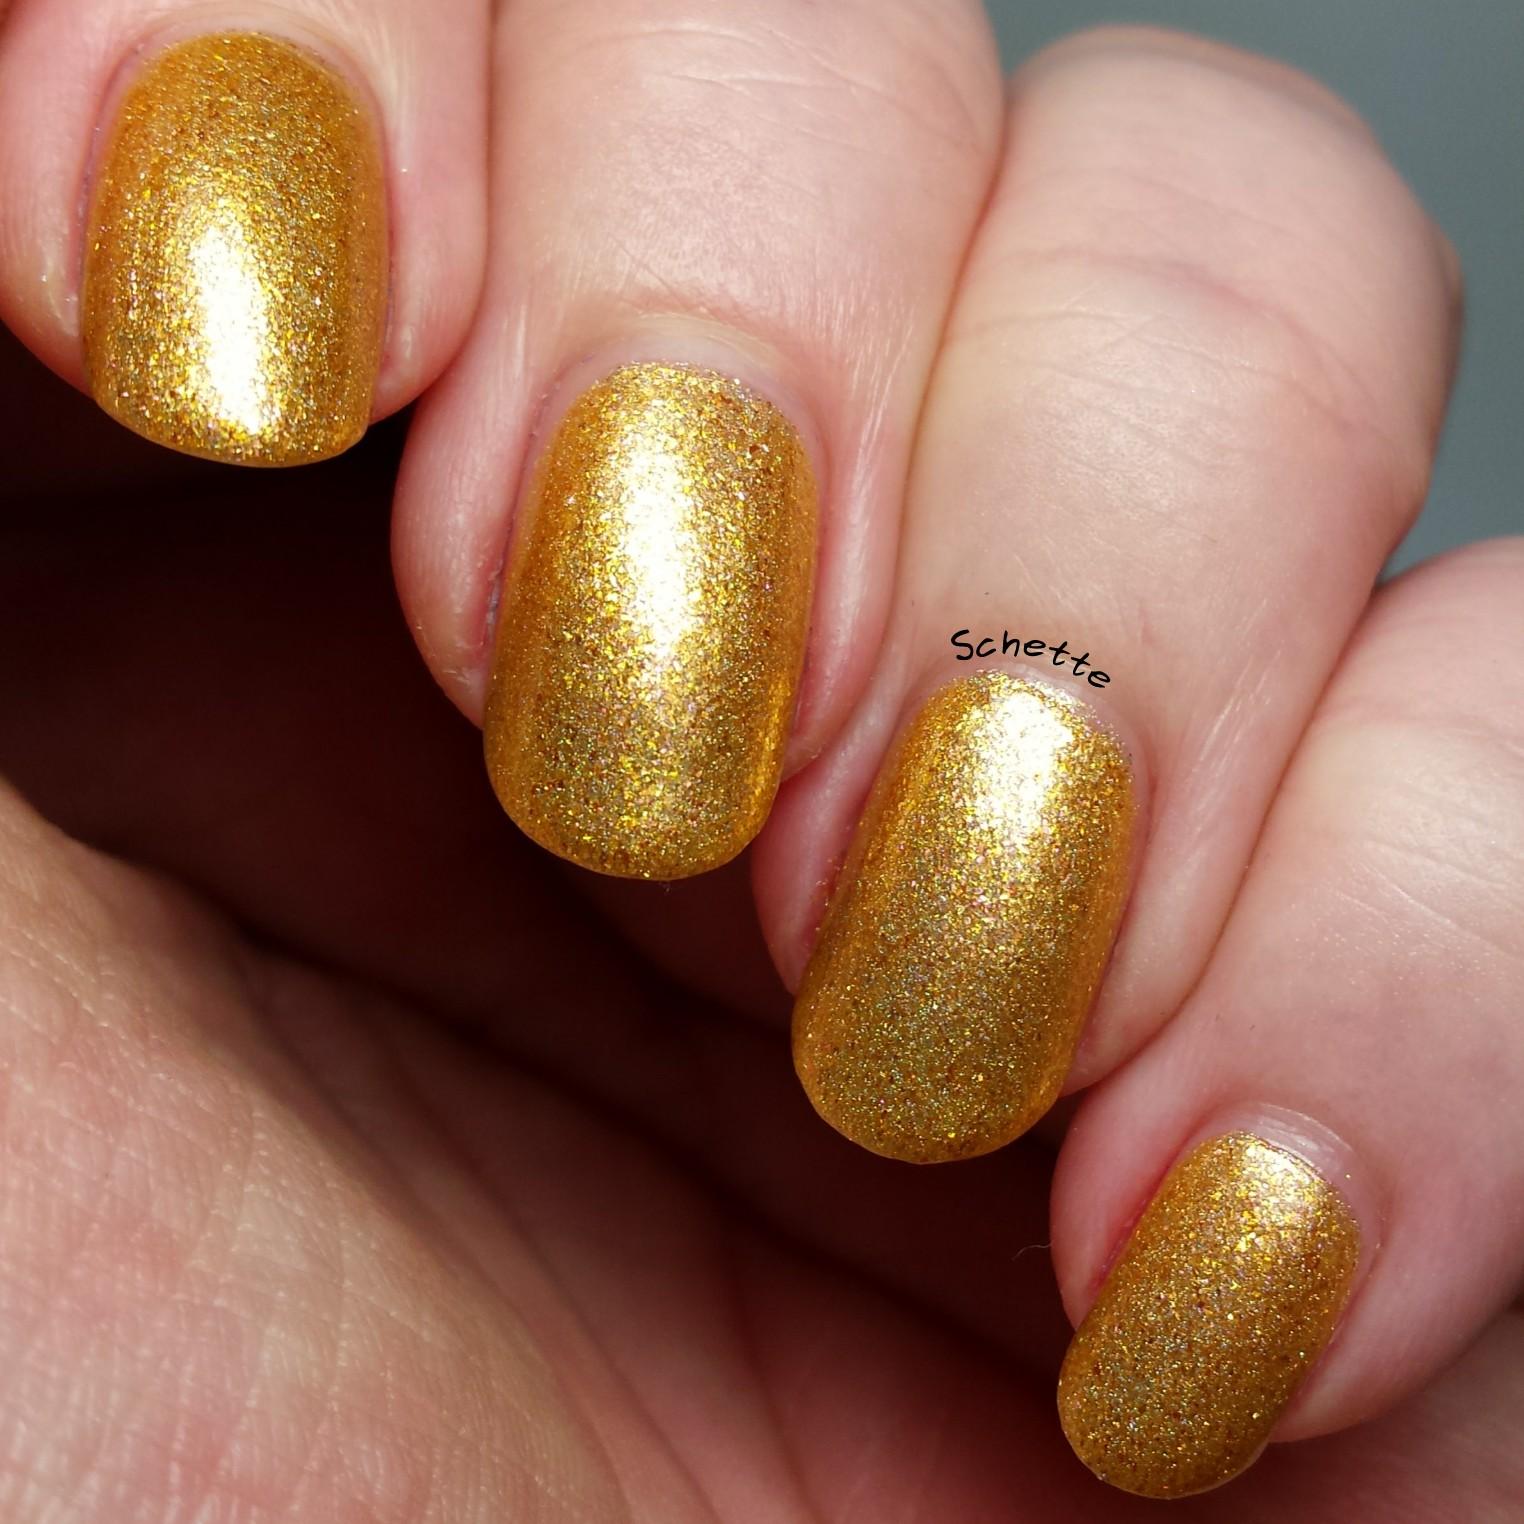 Too Fancy Lacquer - Arthemis